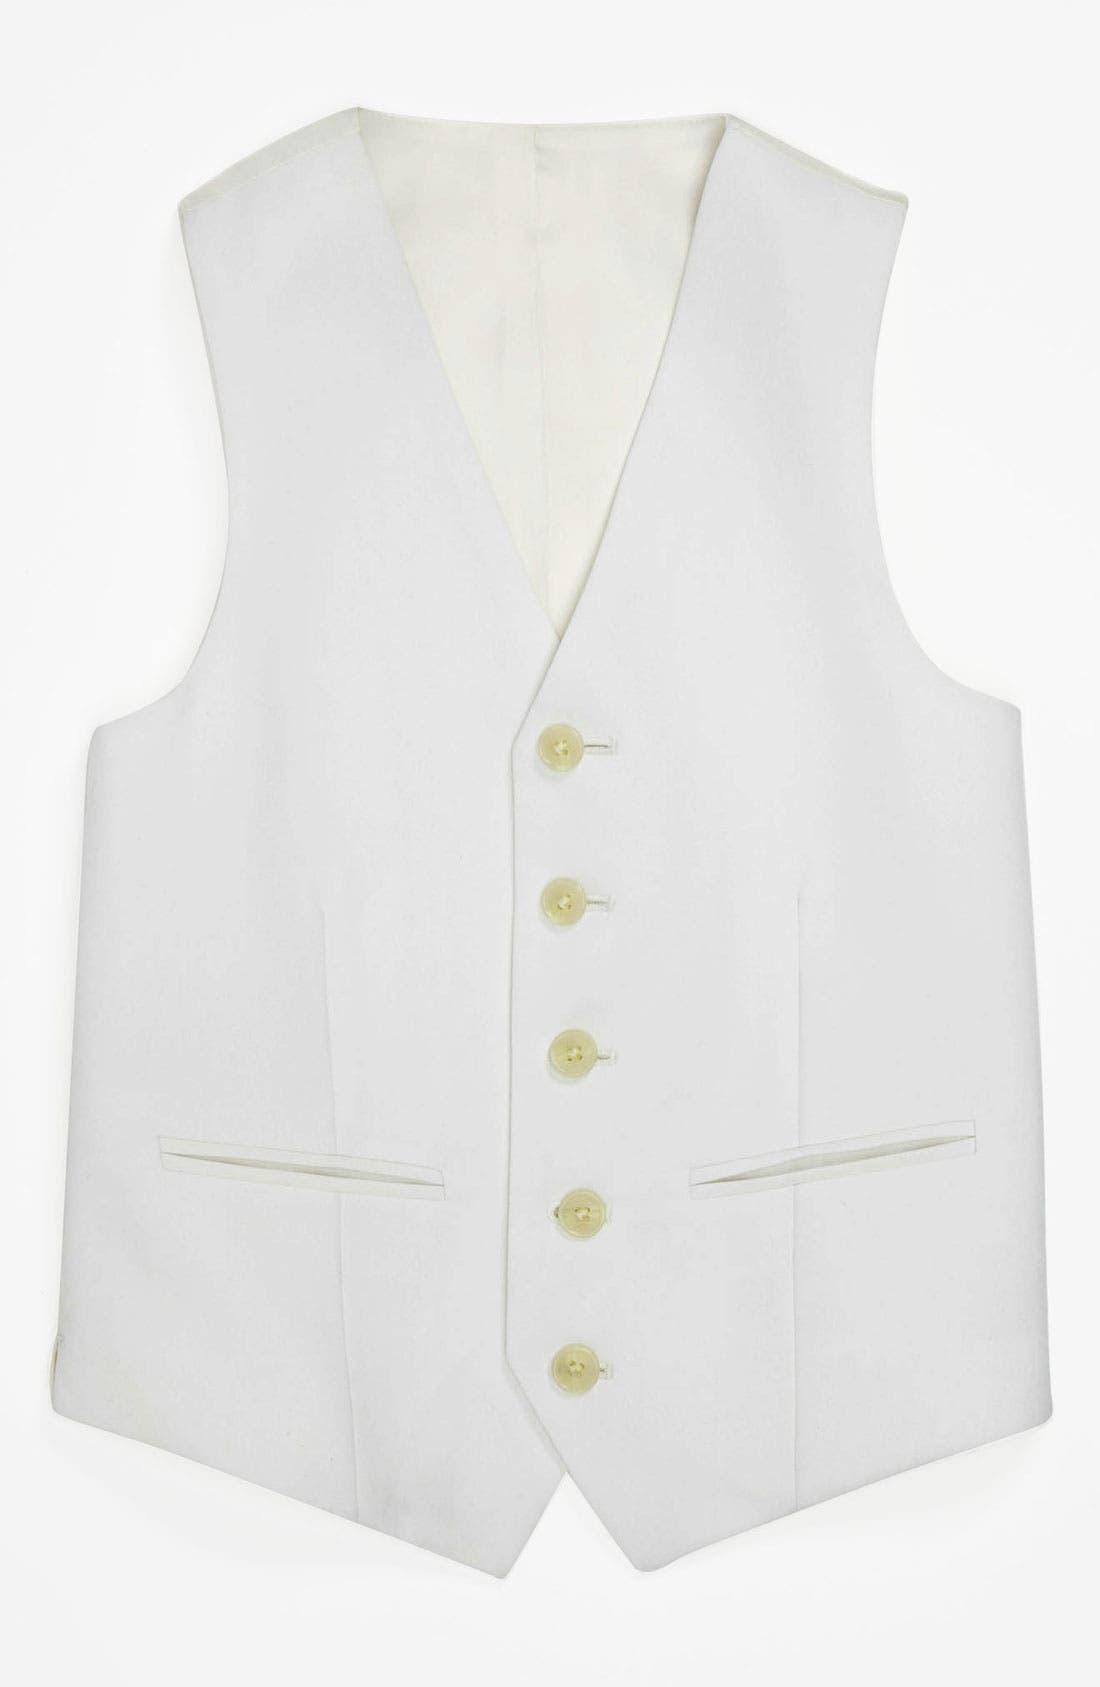 Alternate Image 1 Selected - Joseph Abboud Vest (Little Boys & Big Boys)